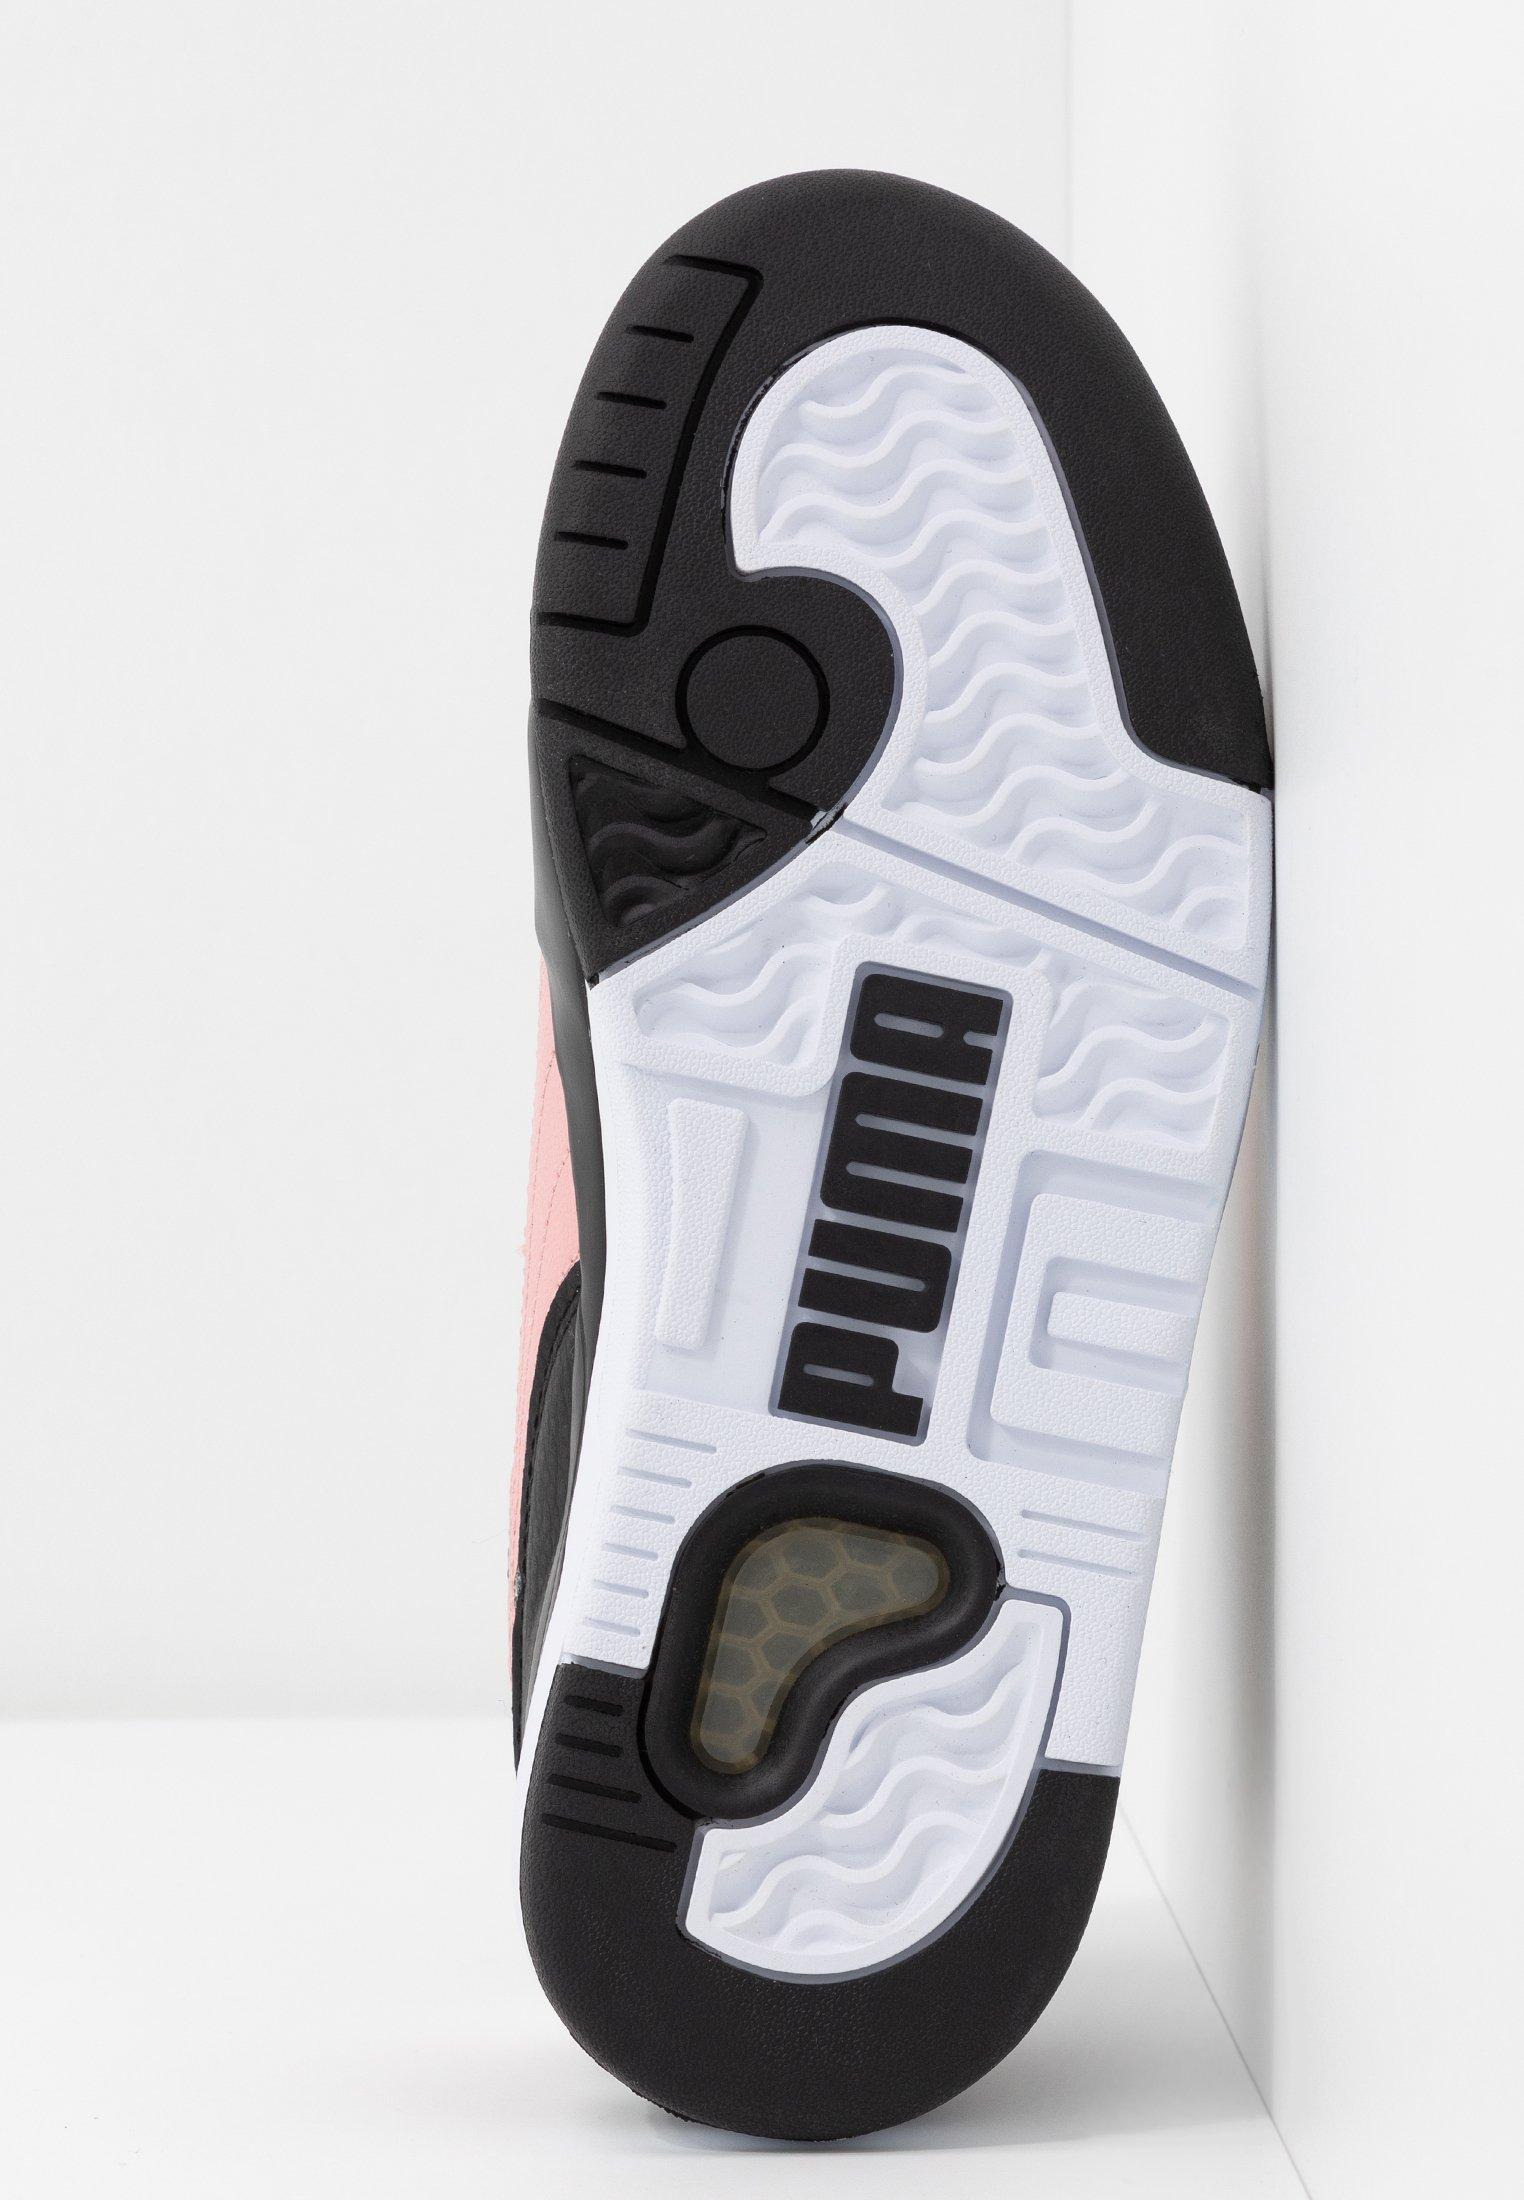 Puma PALACE GUARD BLOCK - Sneaker low - black/white - Black Friday